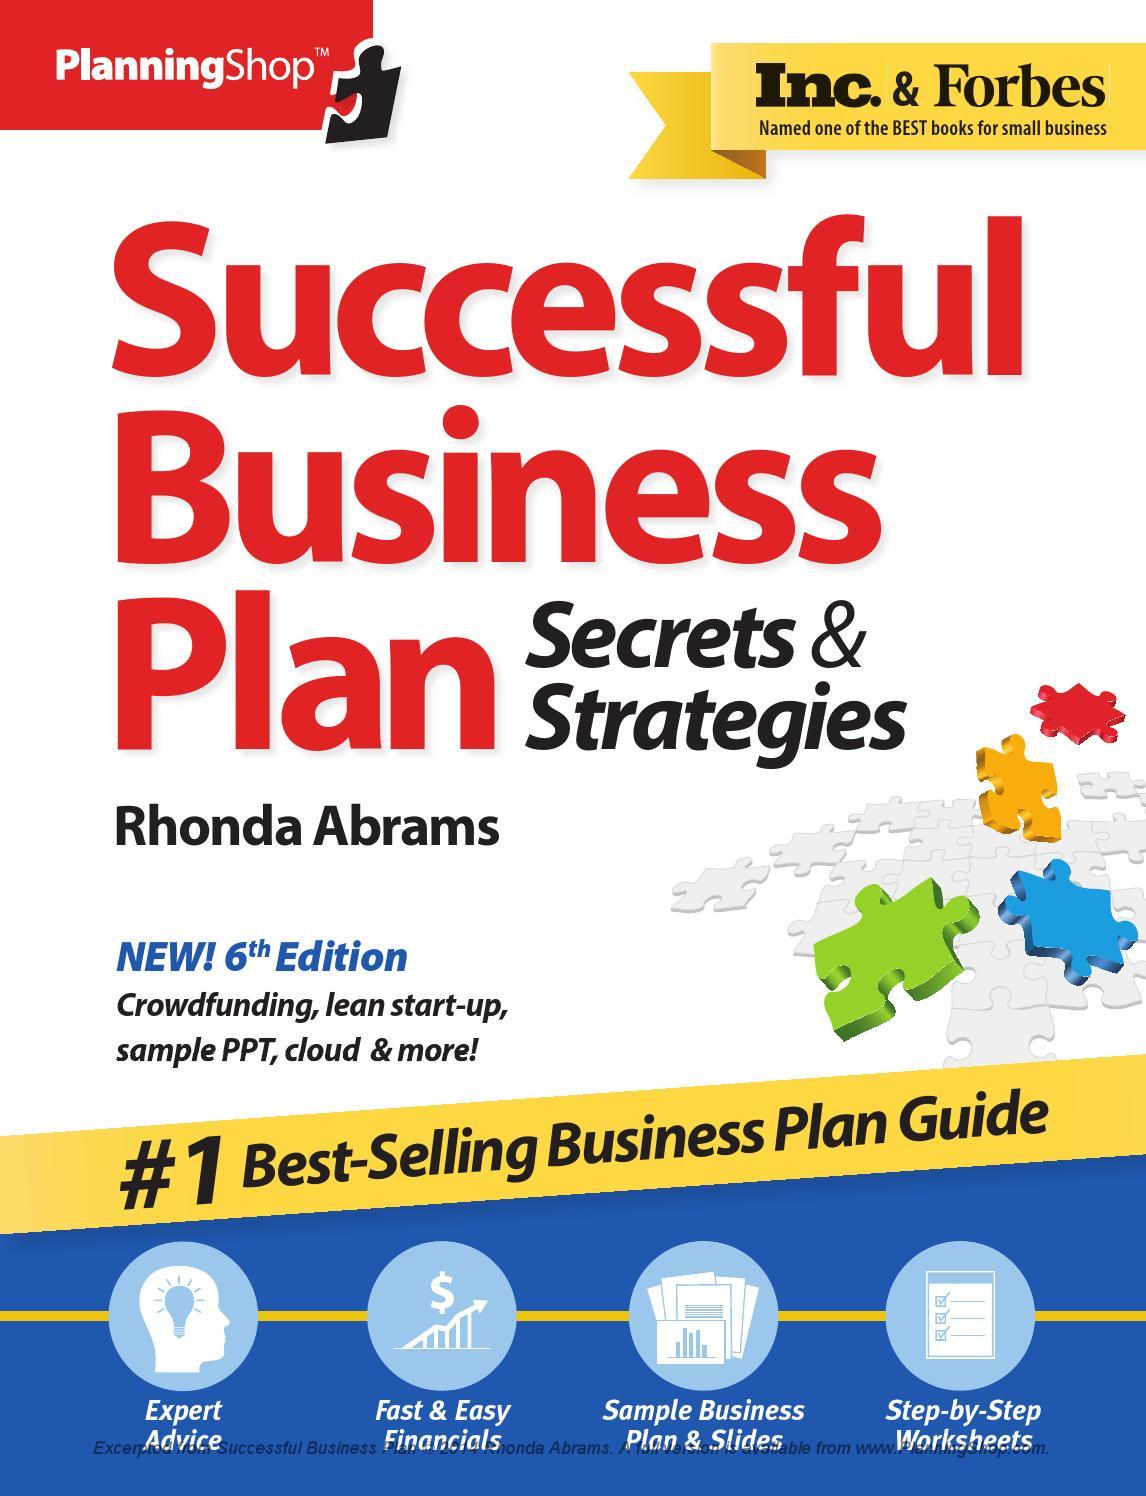 Sba help writing business plan